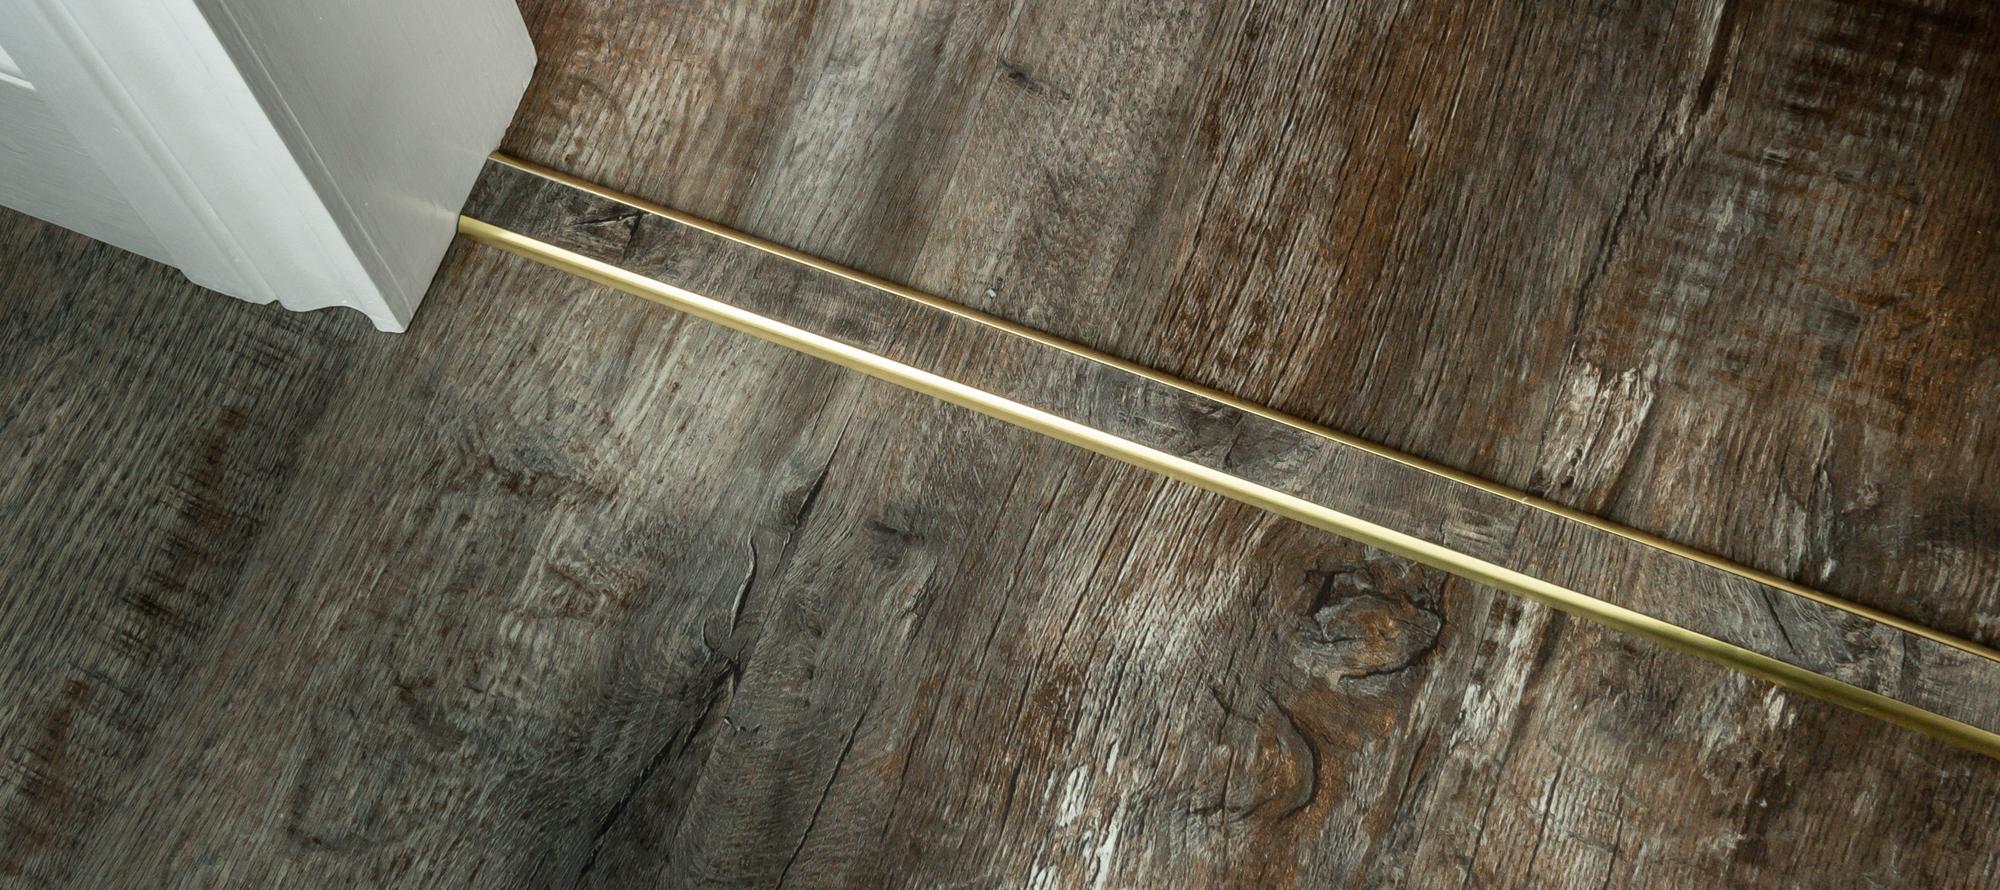 stairrods-uk-brass-ali-tramline-moduleo-select-click-country-oak-5mm-web-banner.jpg